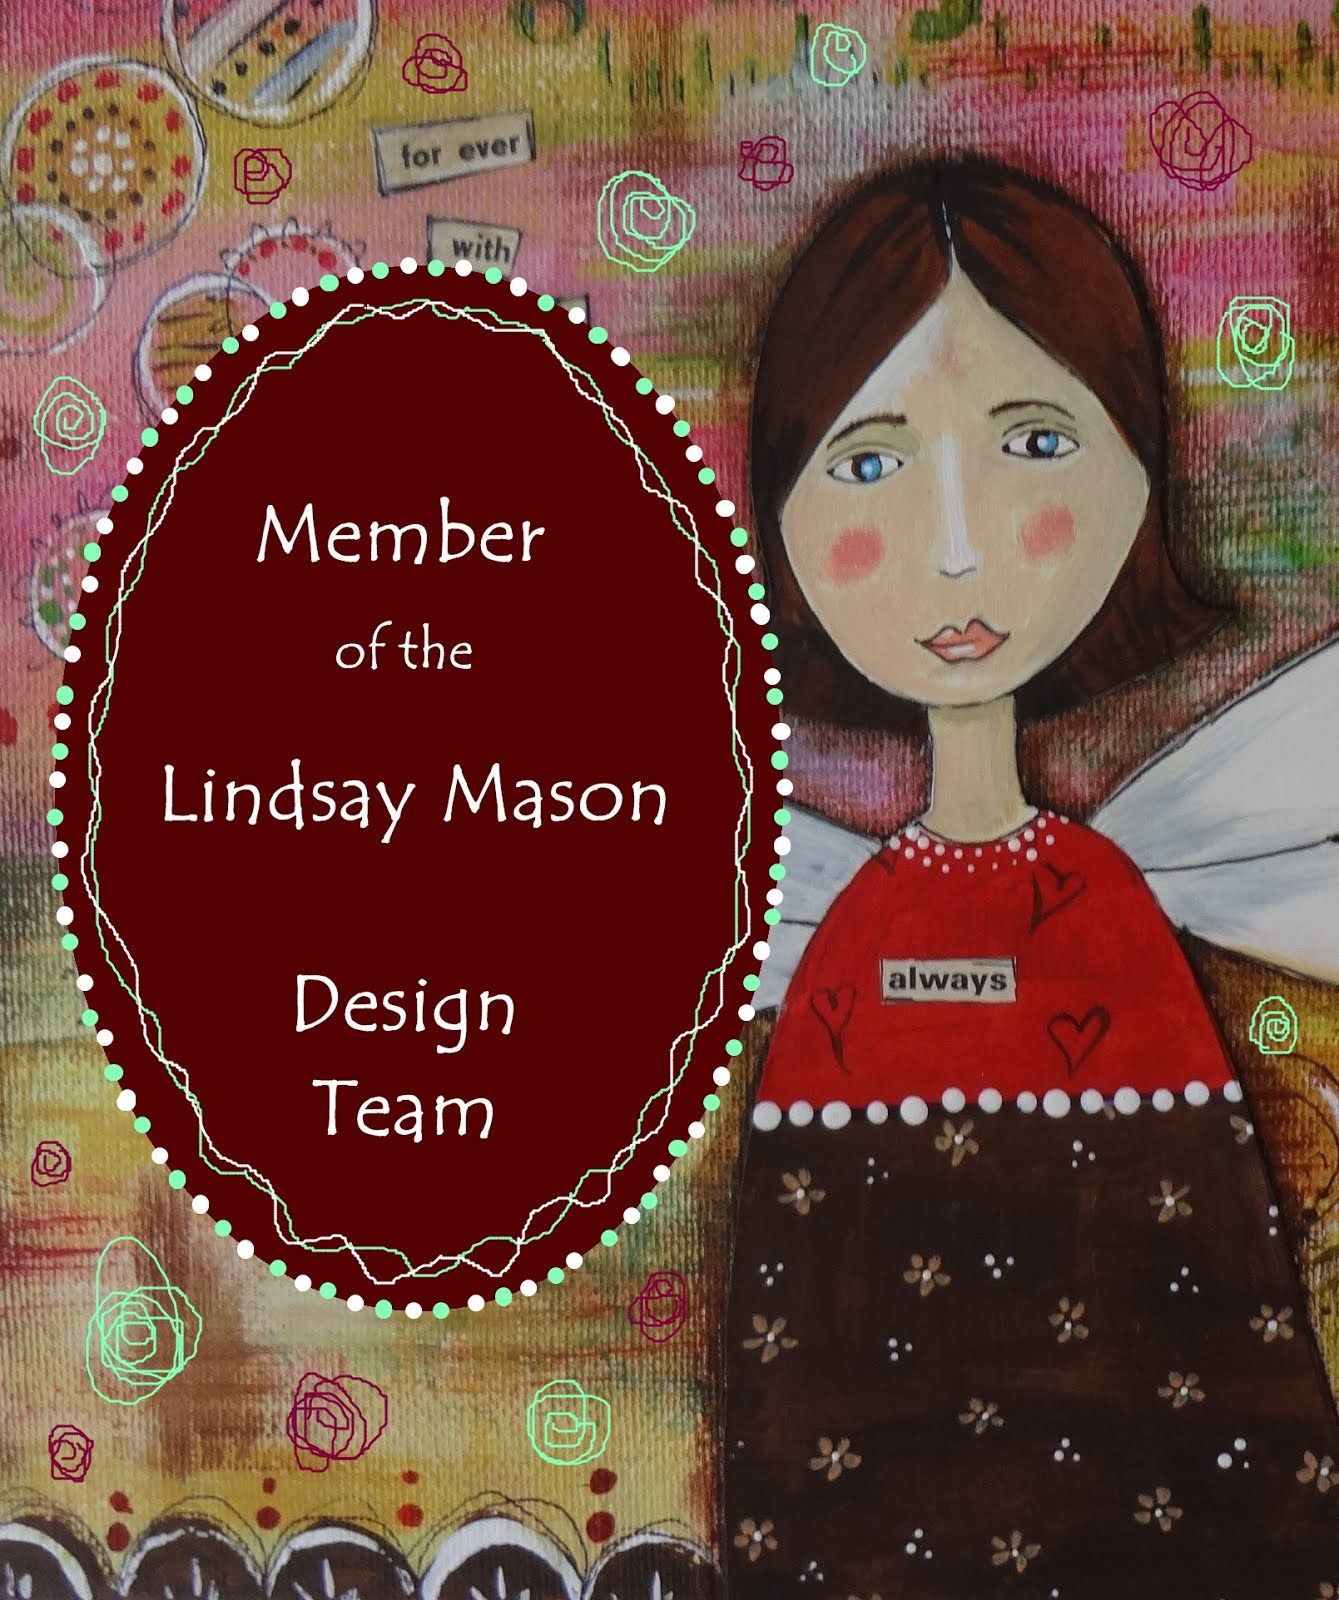 Lindsay Mason DT Member